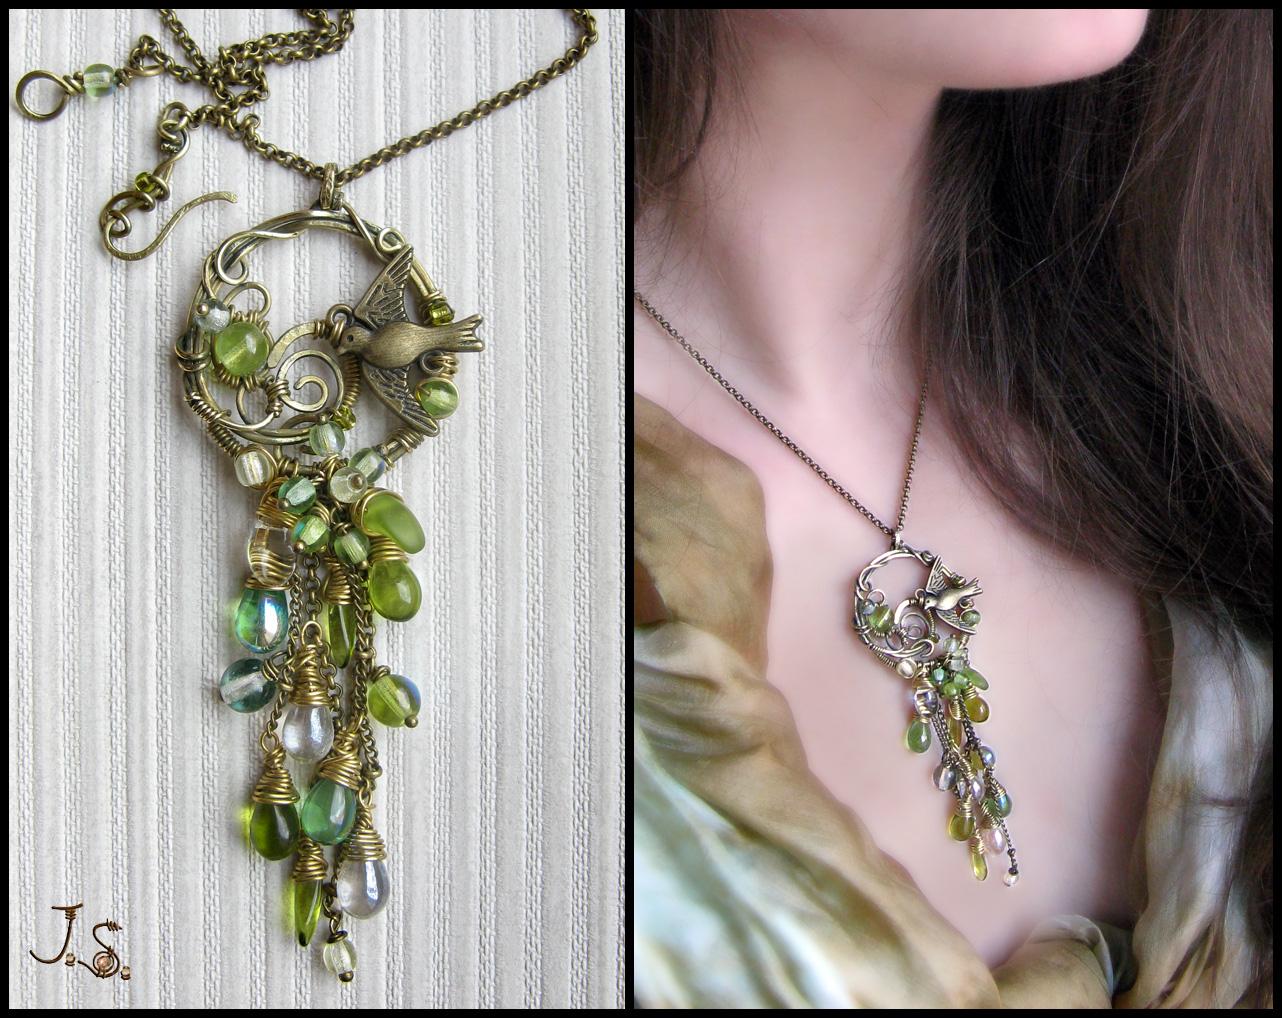 Cascade pendant May showers by JSjewelry